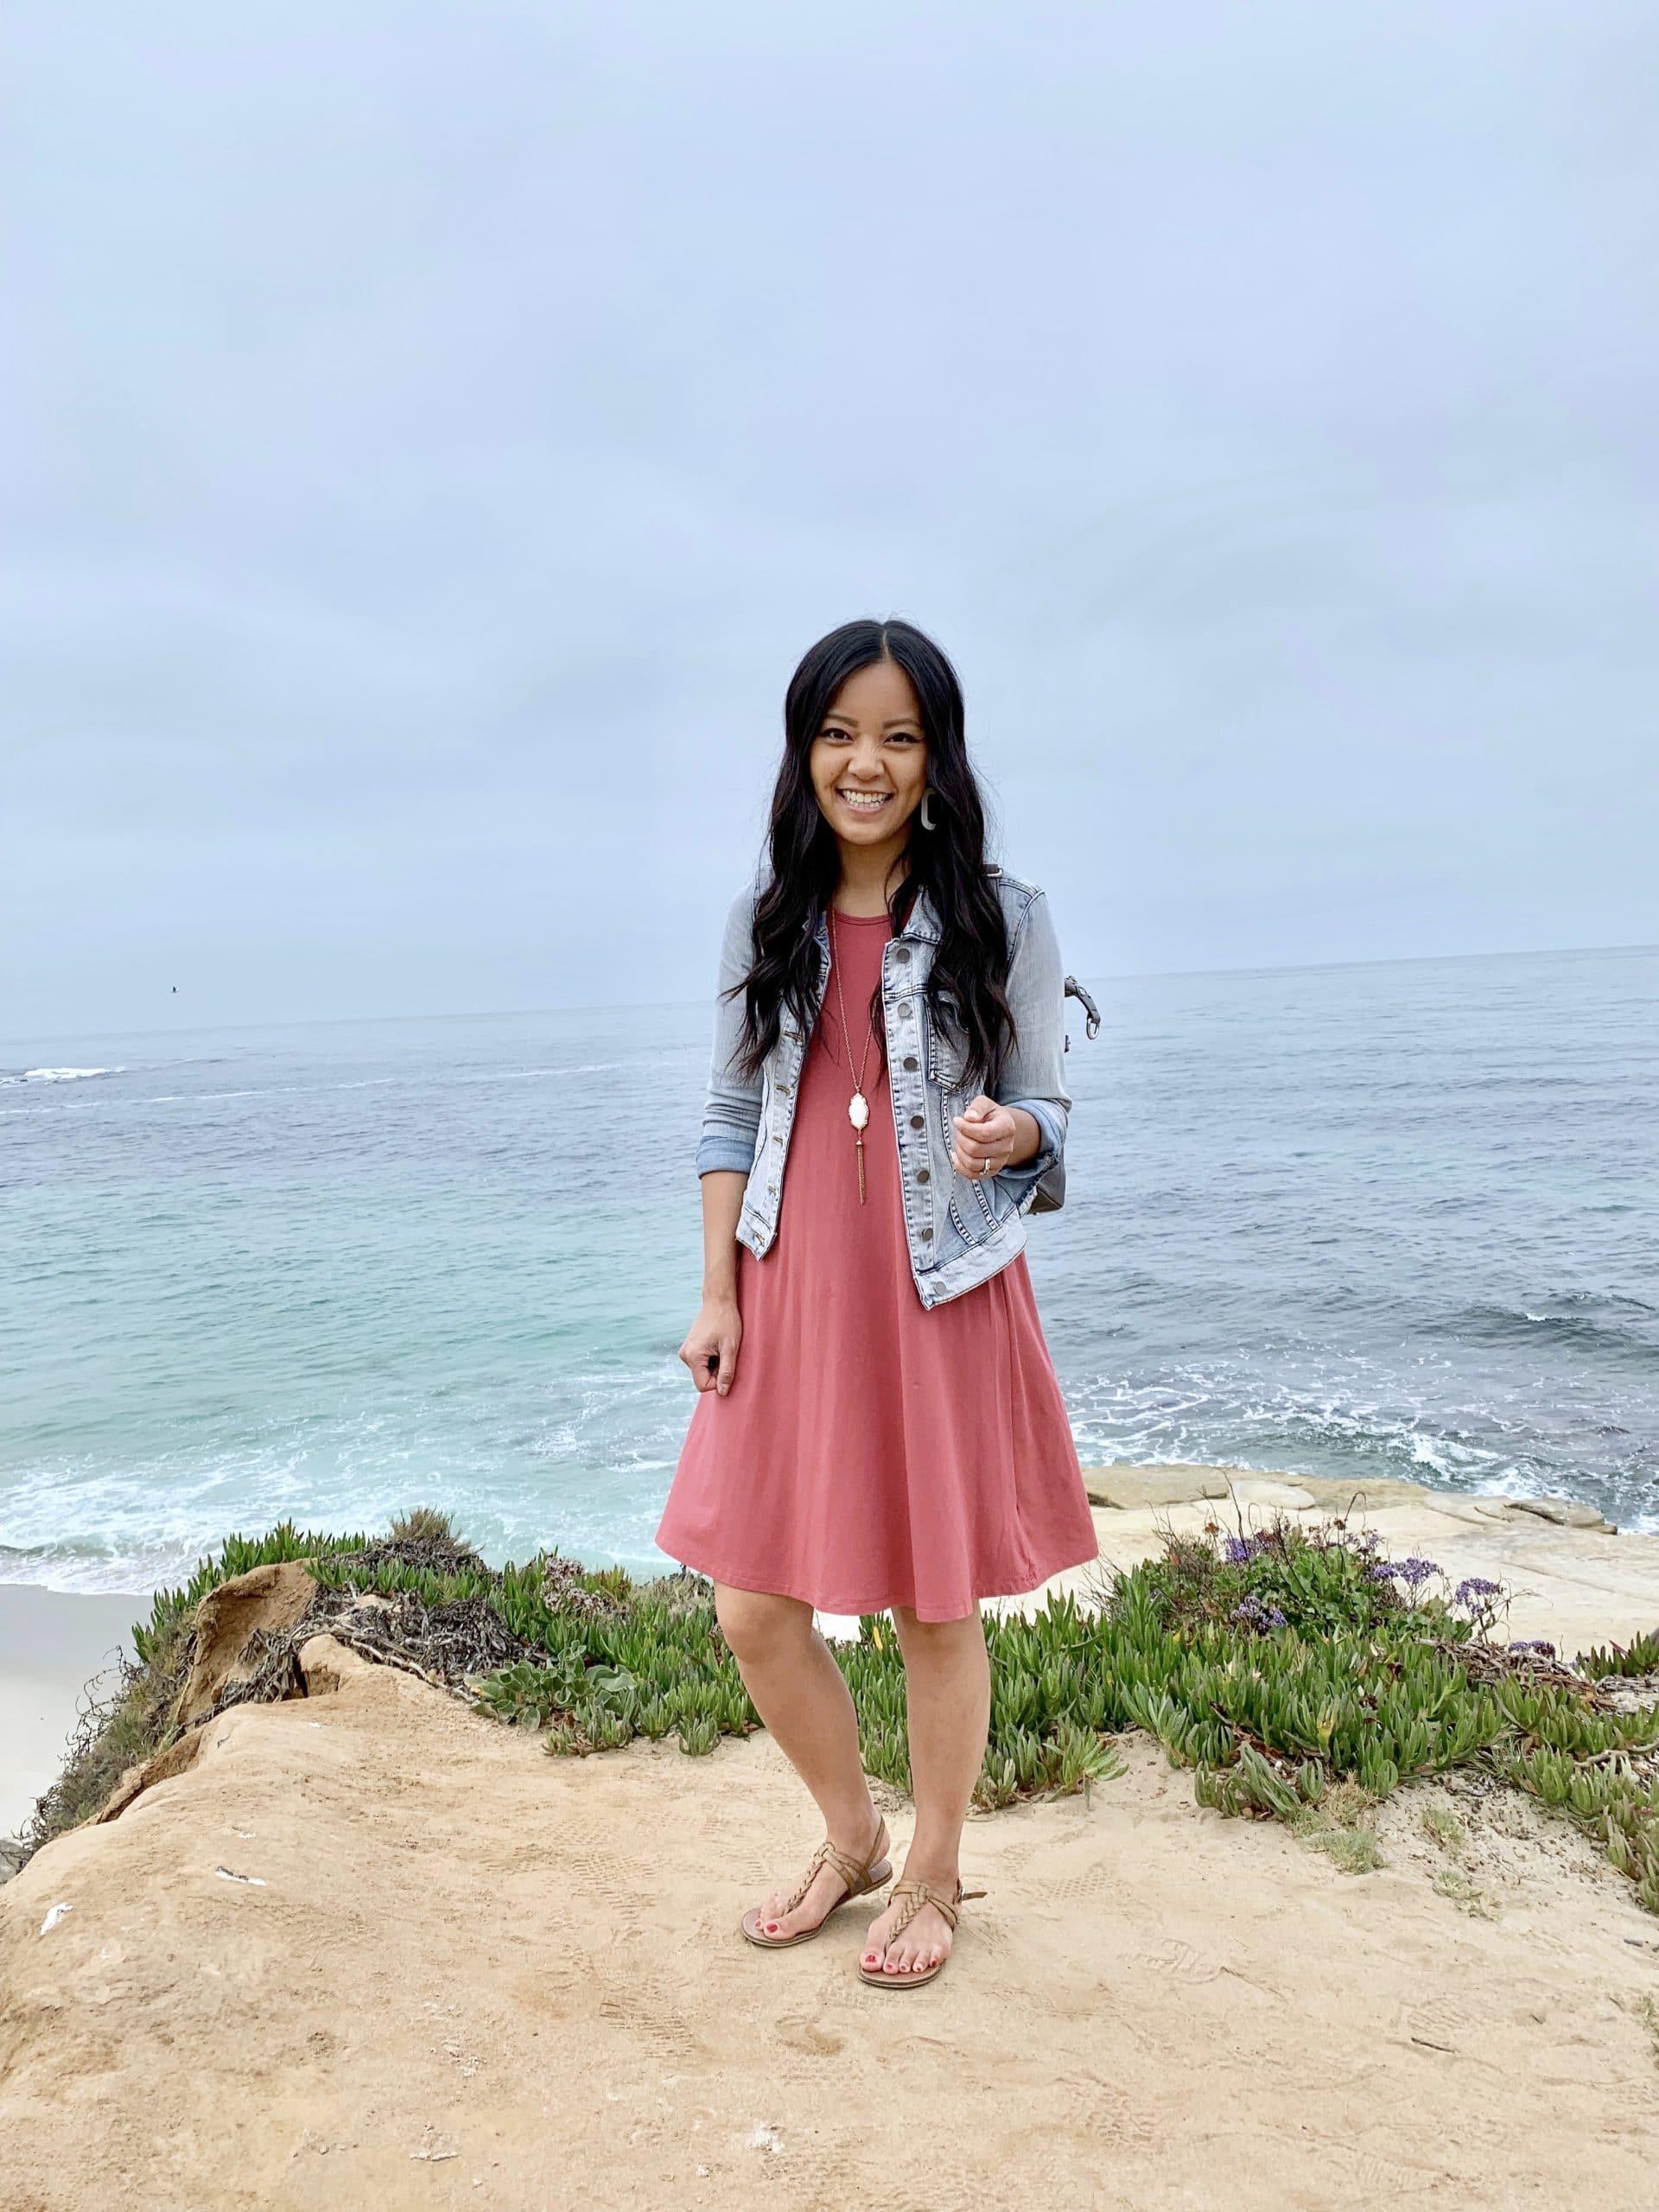 Spring Dress Outfit: pink swing dress + denim jacket + tan sandals + gold tassel necklace